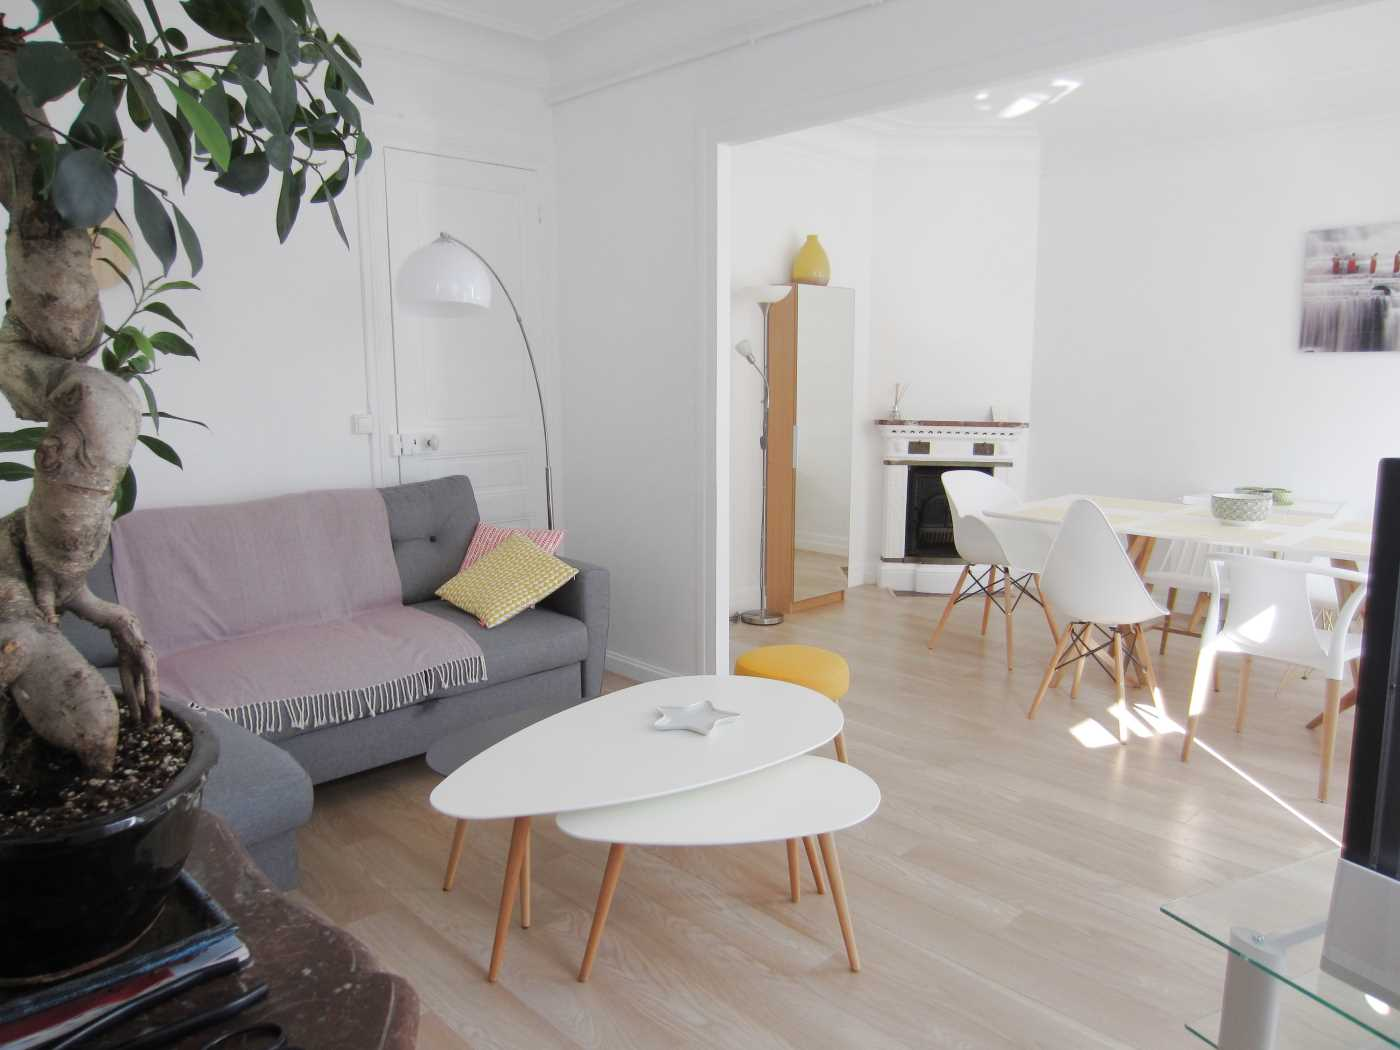 Location appartement meubl paris 15 cattalan johnson for Appartement meuble location paris